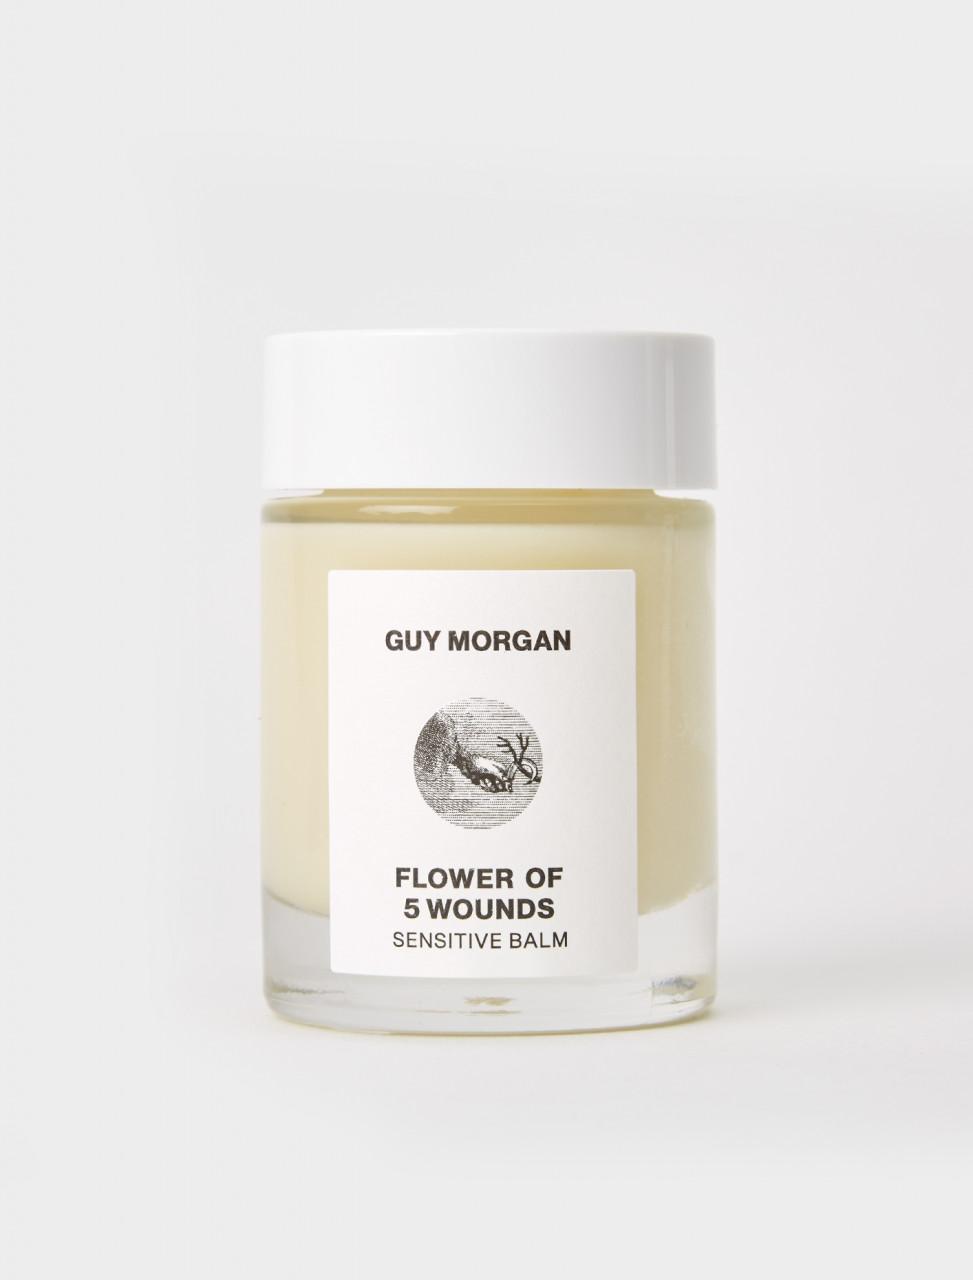 FO5WB GUY MORGAN FLOWER OF 5 WOUNDS SENSITIVE BALM 50G